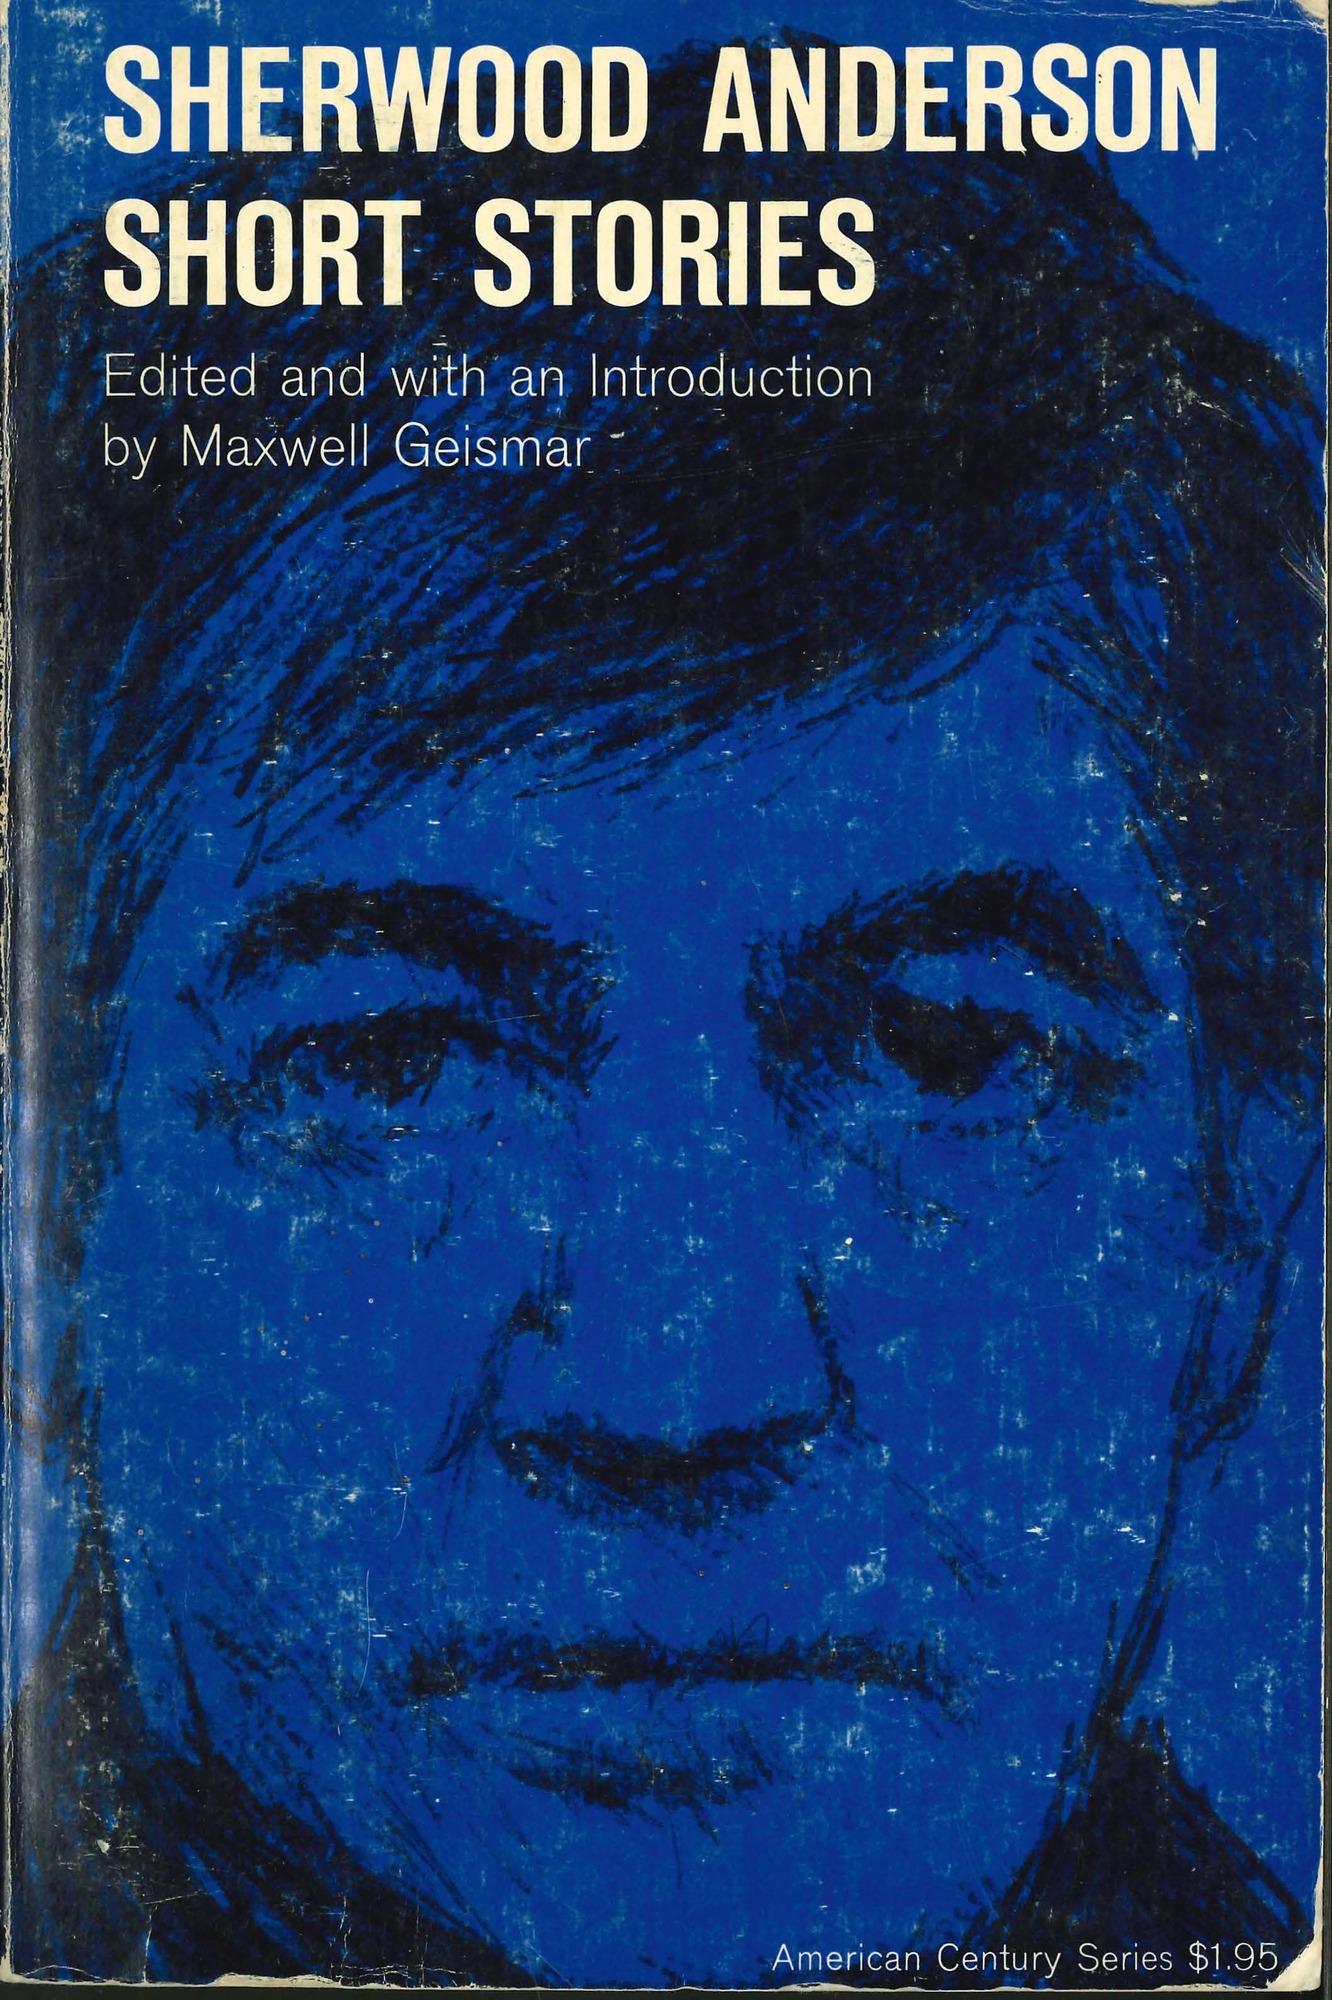 ShortStories_1962.jpg